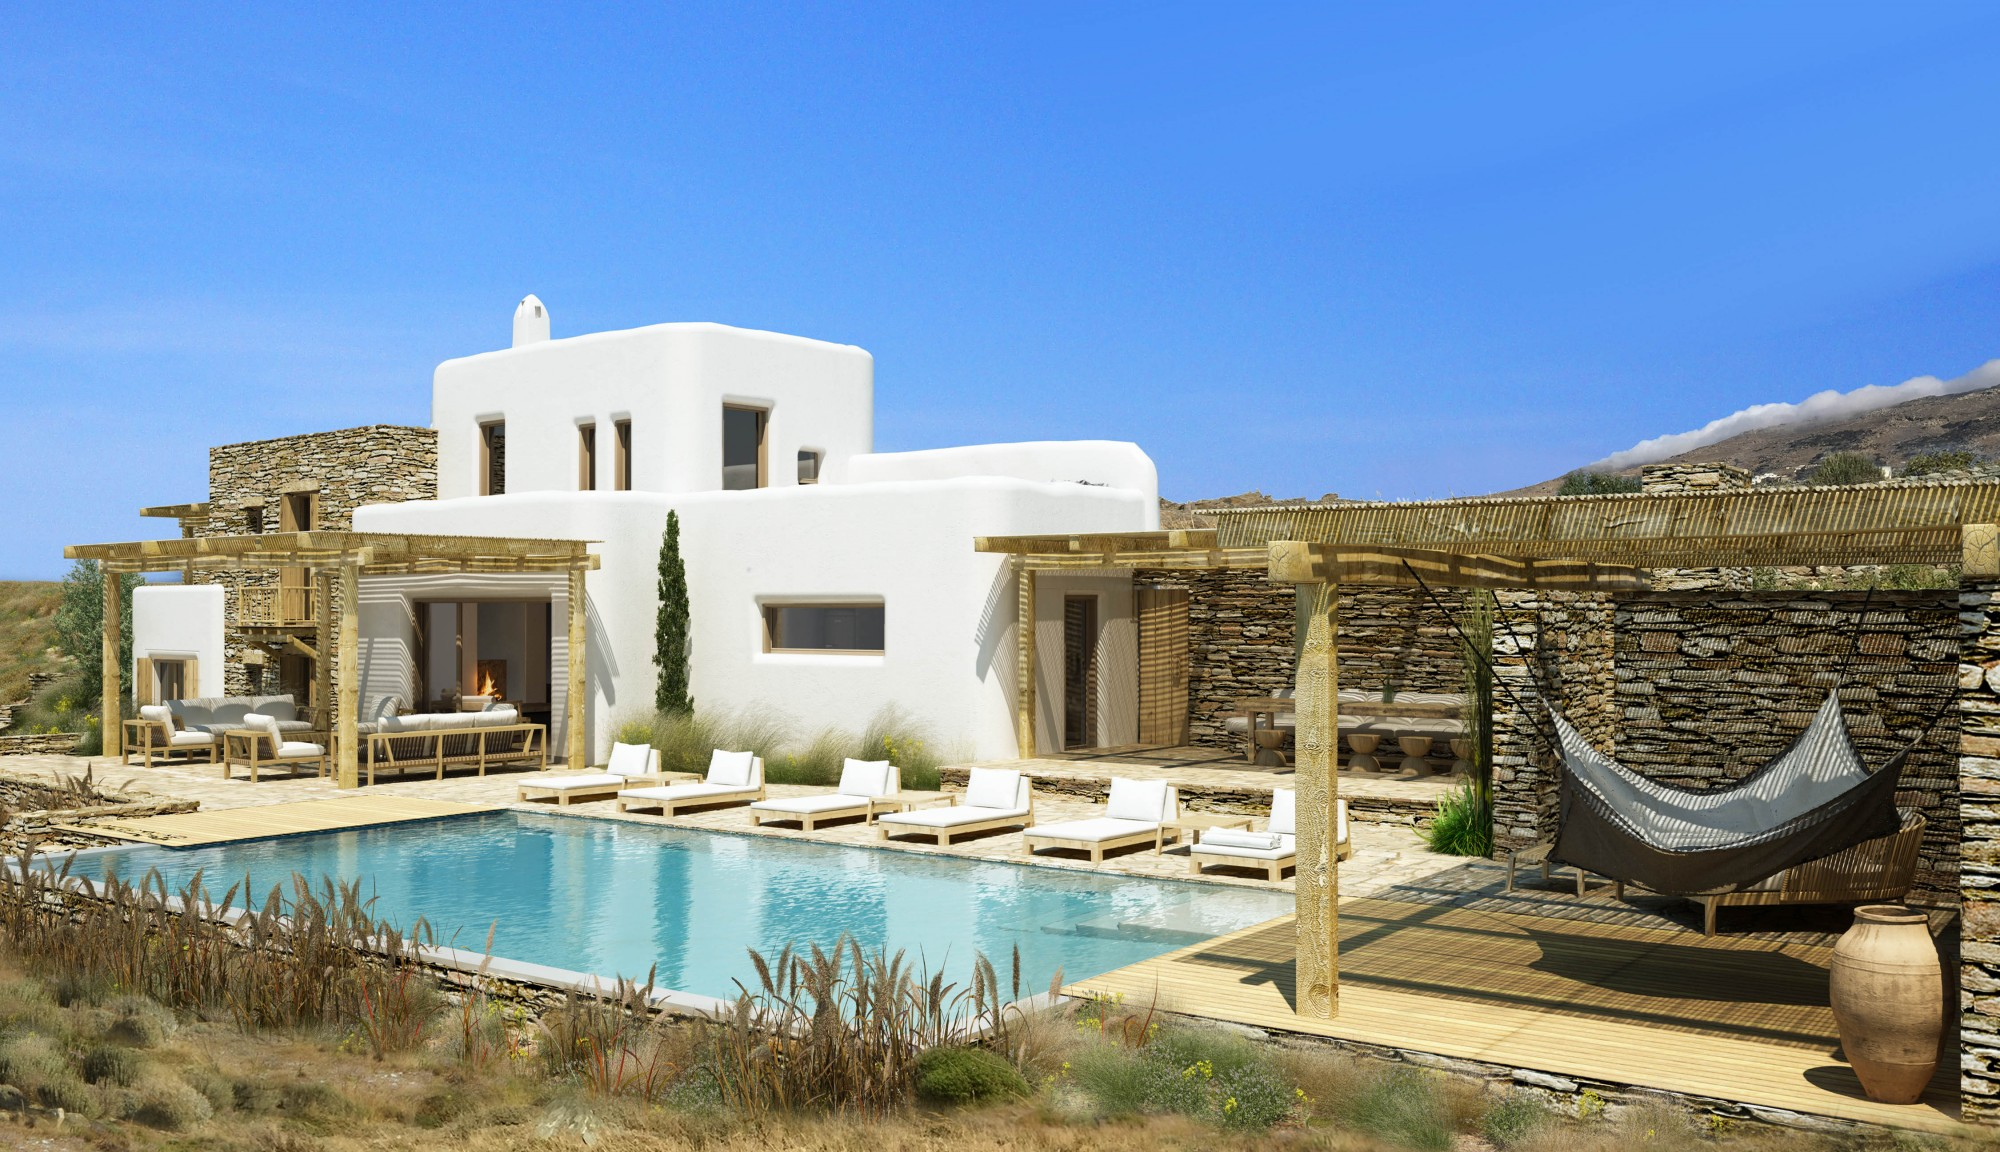 Superbe villa avec piscine en Grèce